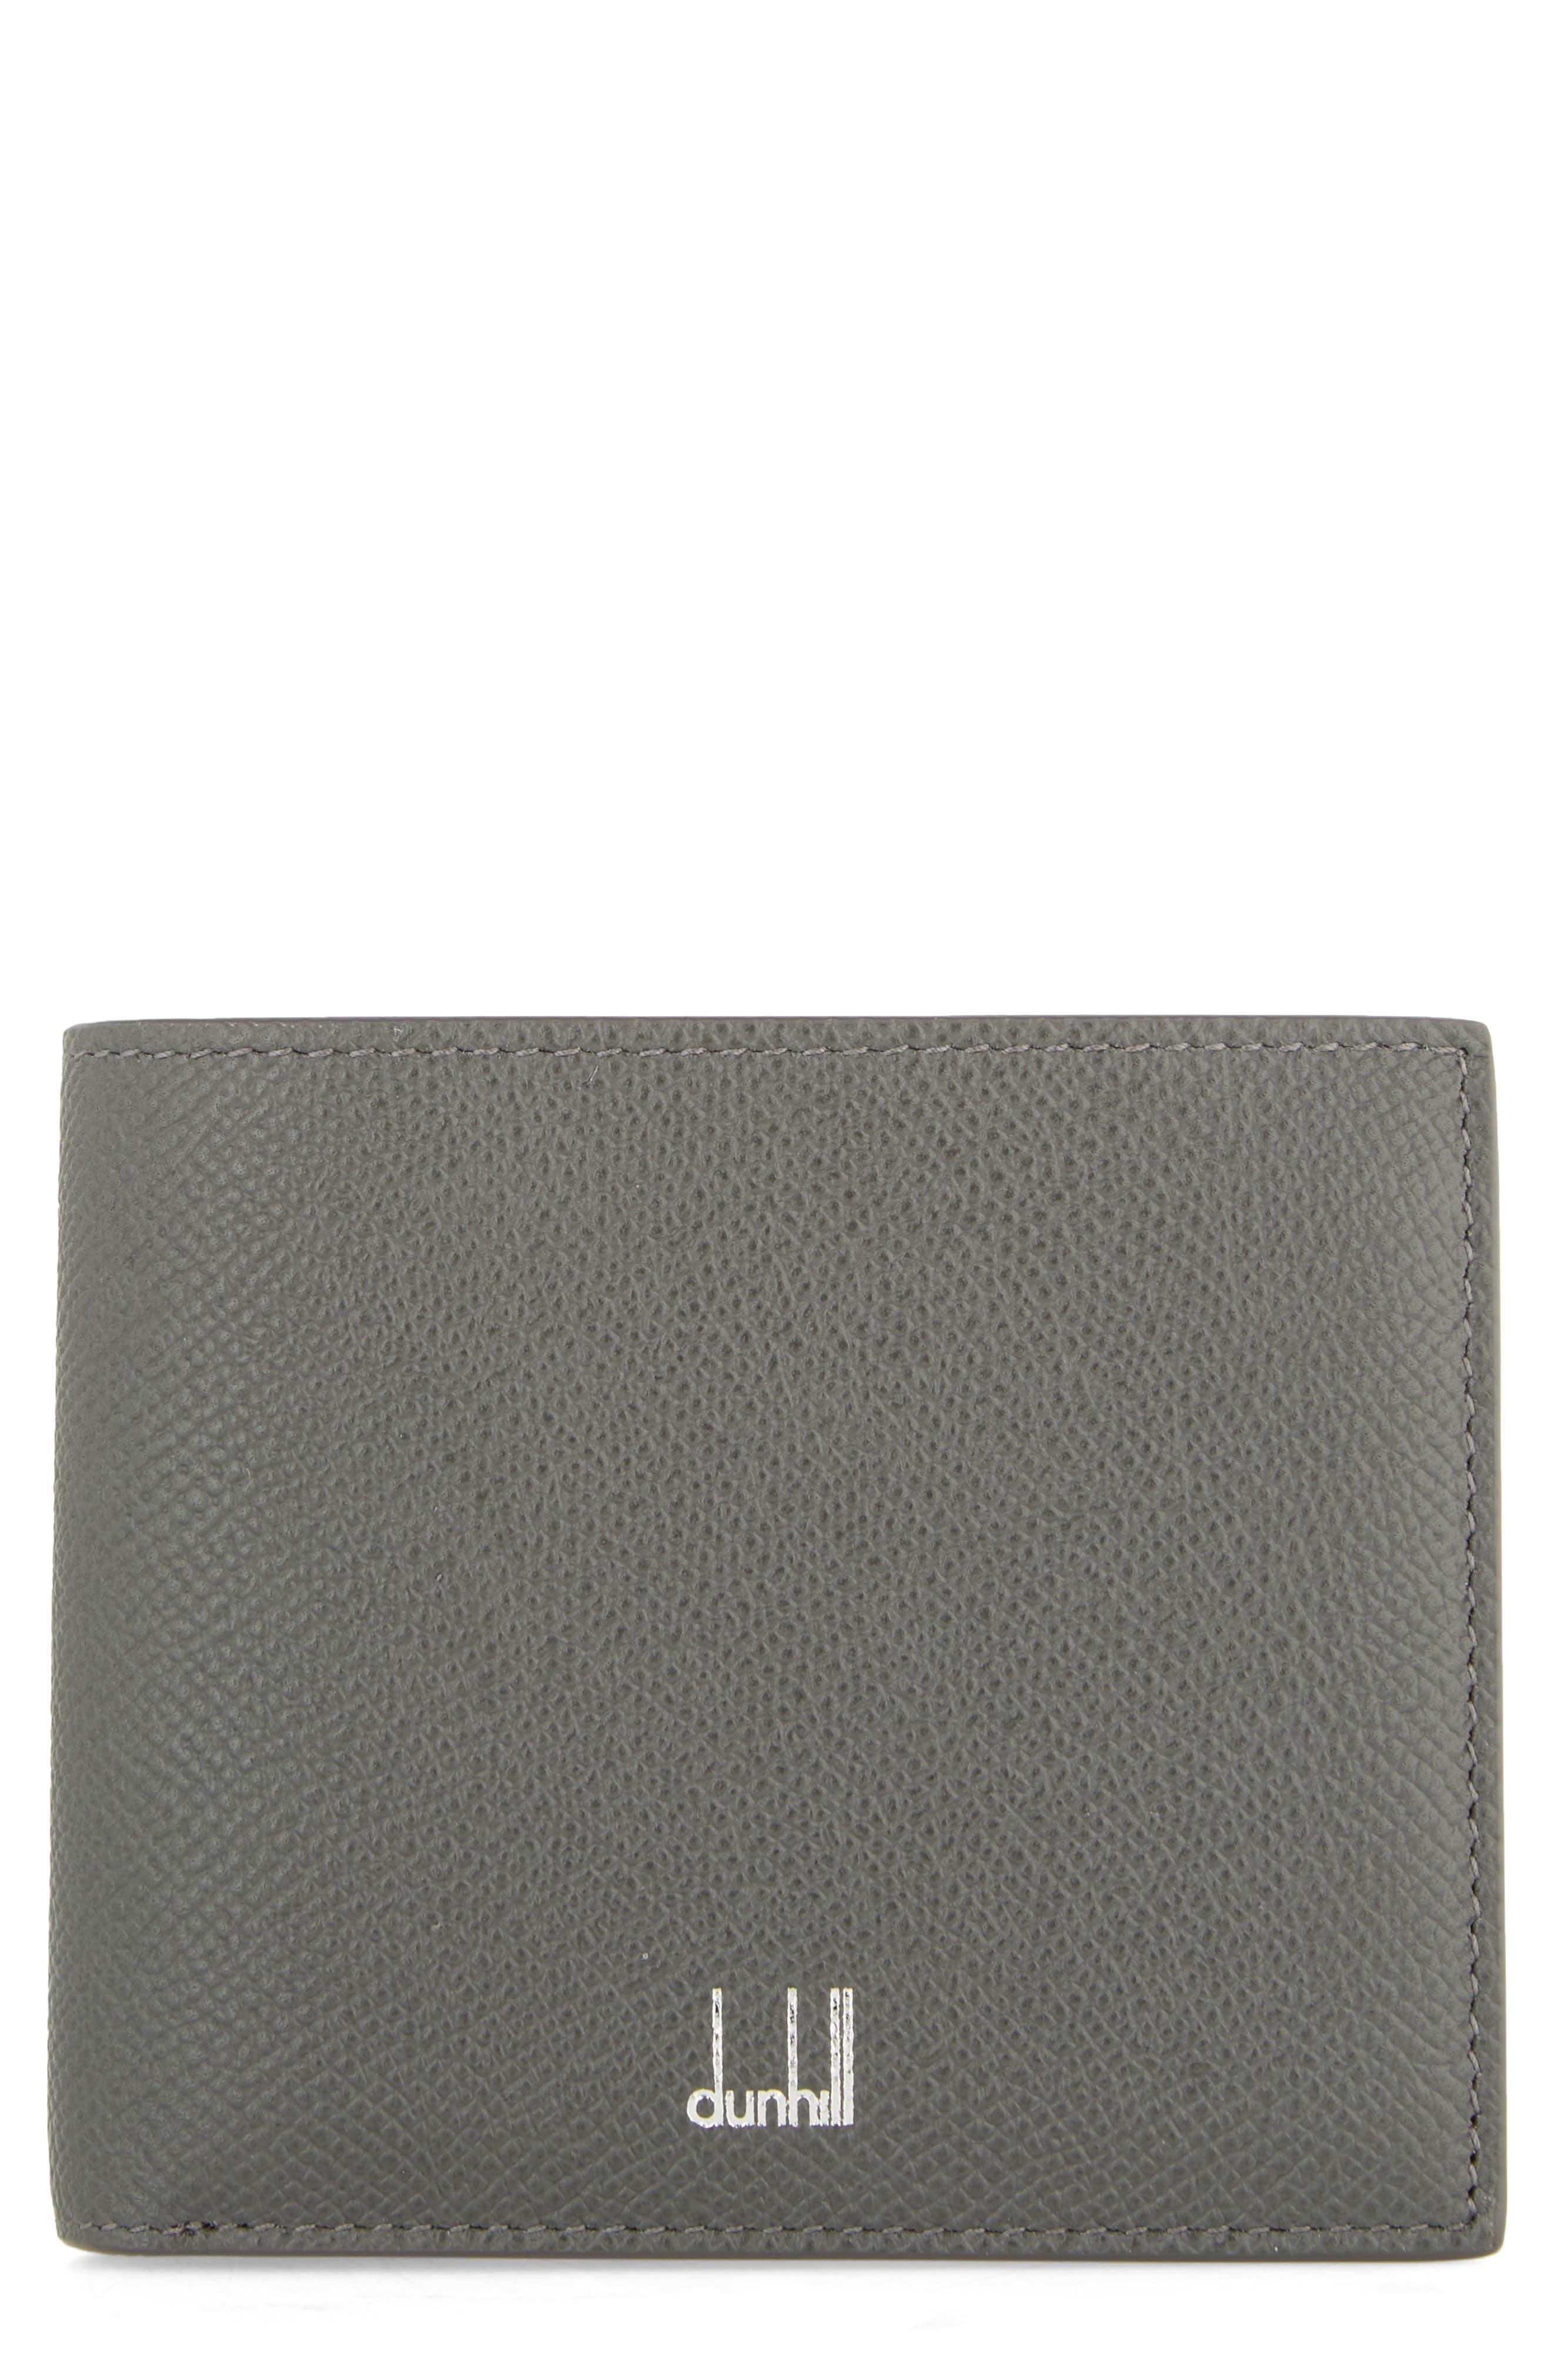 Cadogan Leather Wallet,                             Main thumbnail 1, color,                             GREY